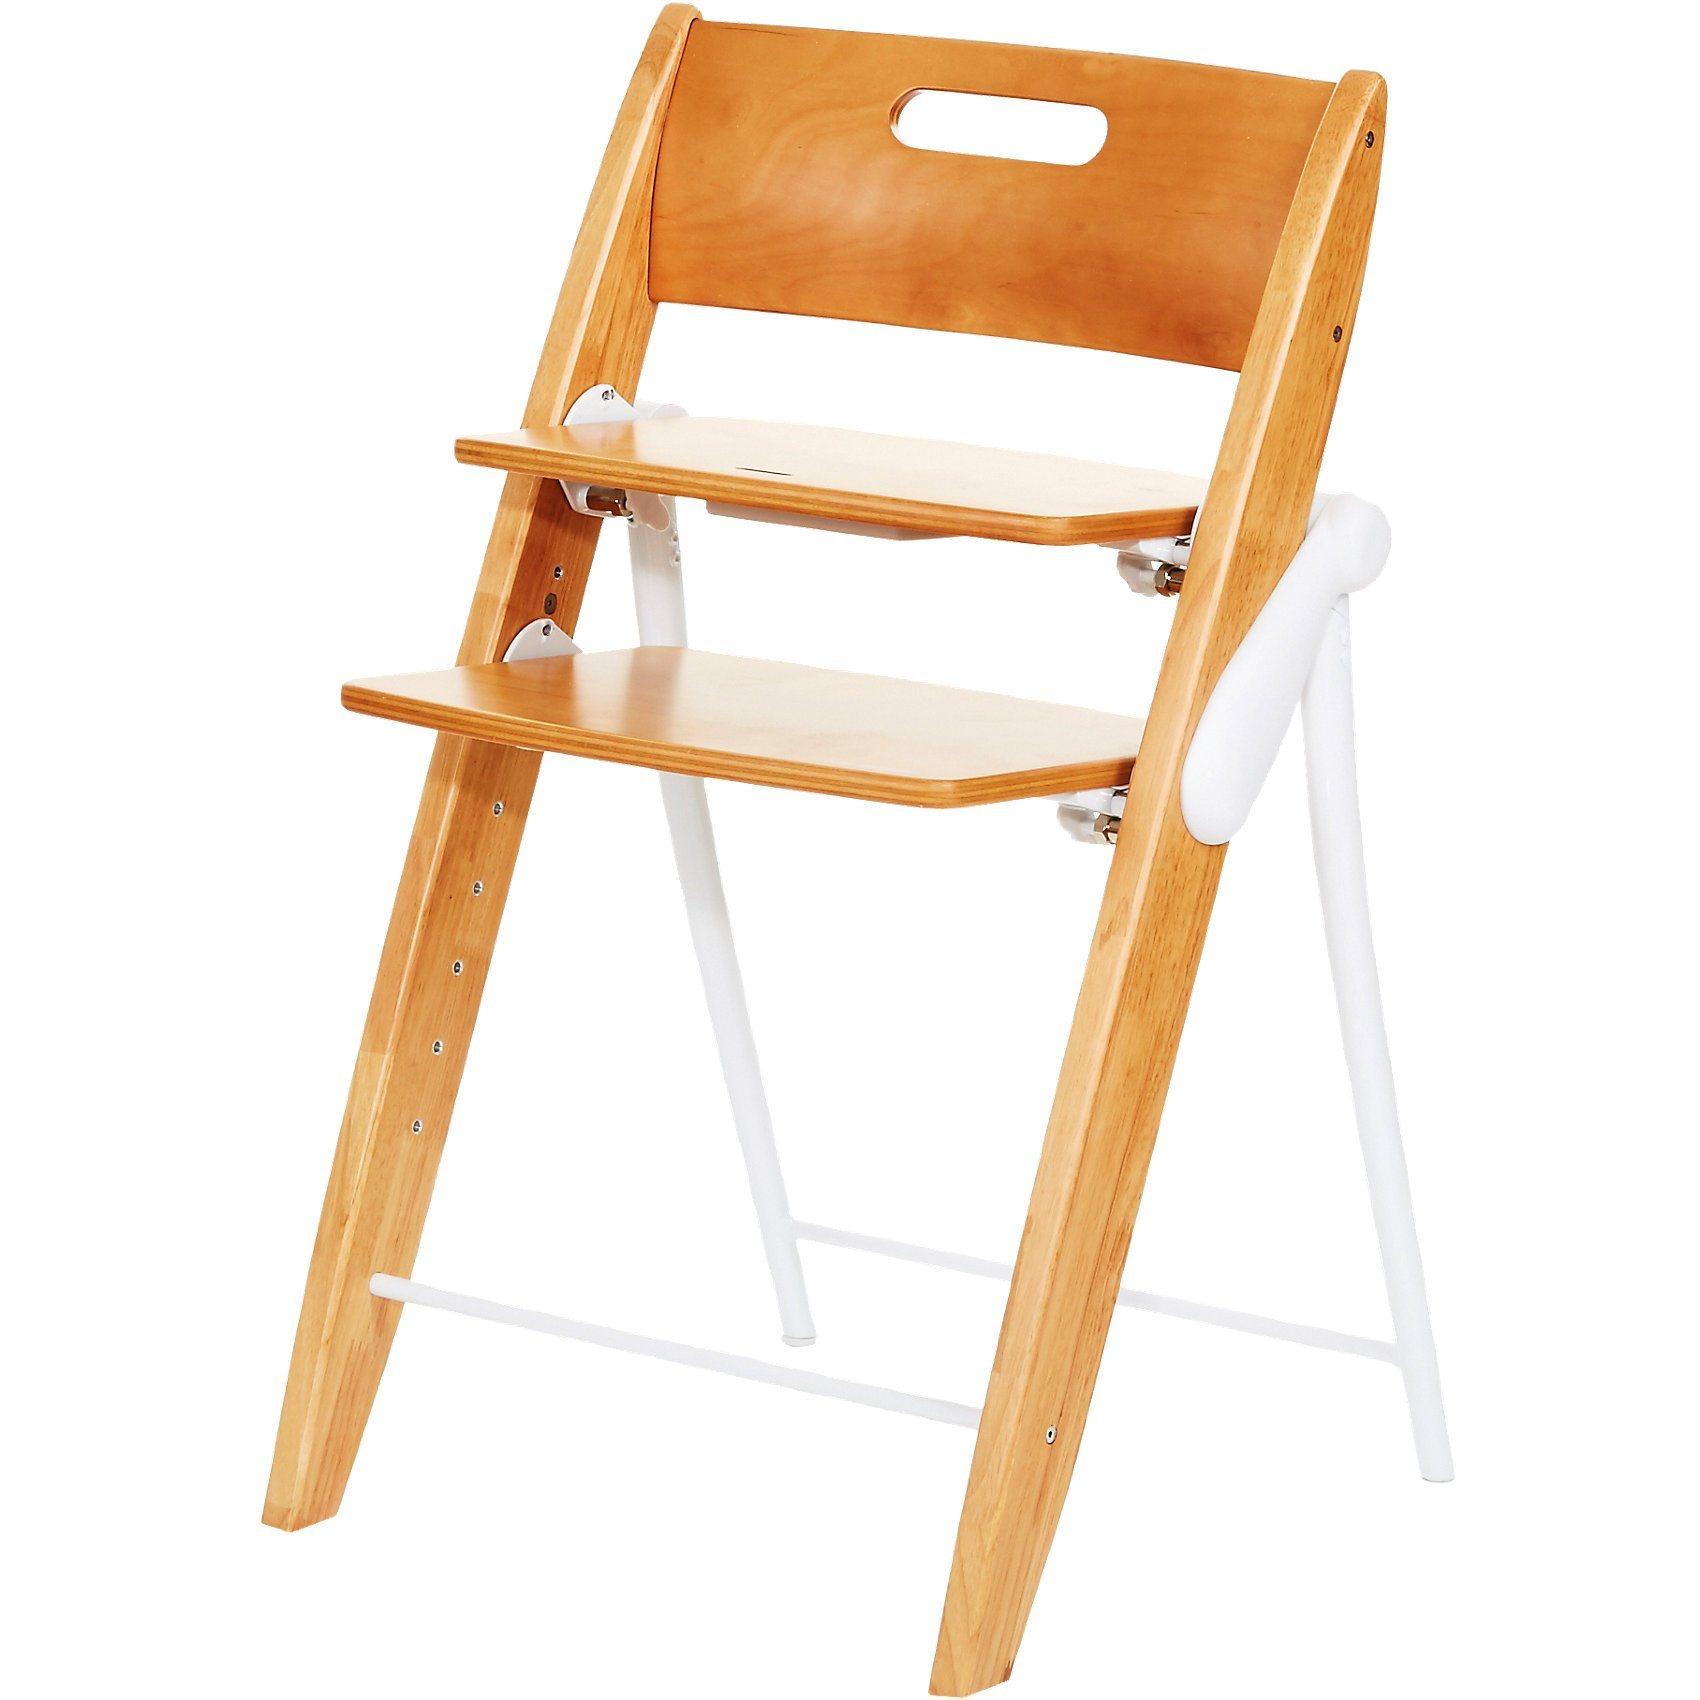 ABC Design Treppenhochstuhl Hopper, nature   Kinderzimmer > Kinderzimmerstühle > Hochstühle   Metall - Holz   ABC Design